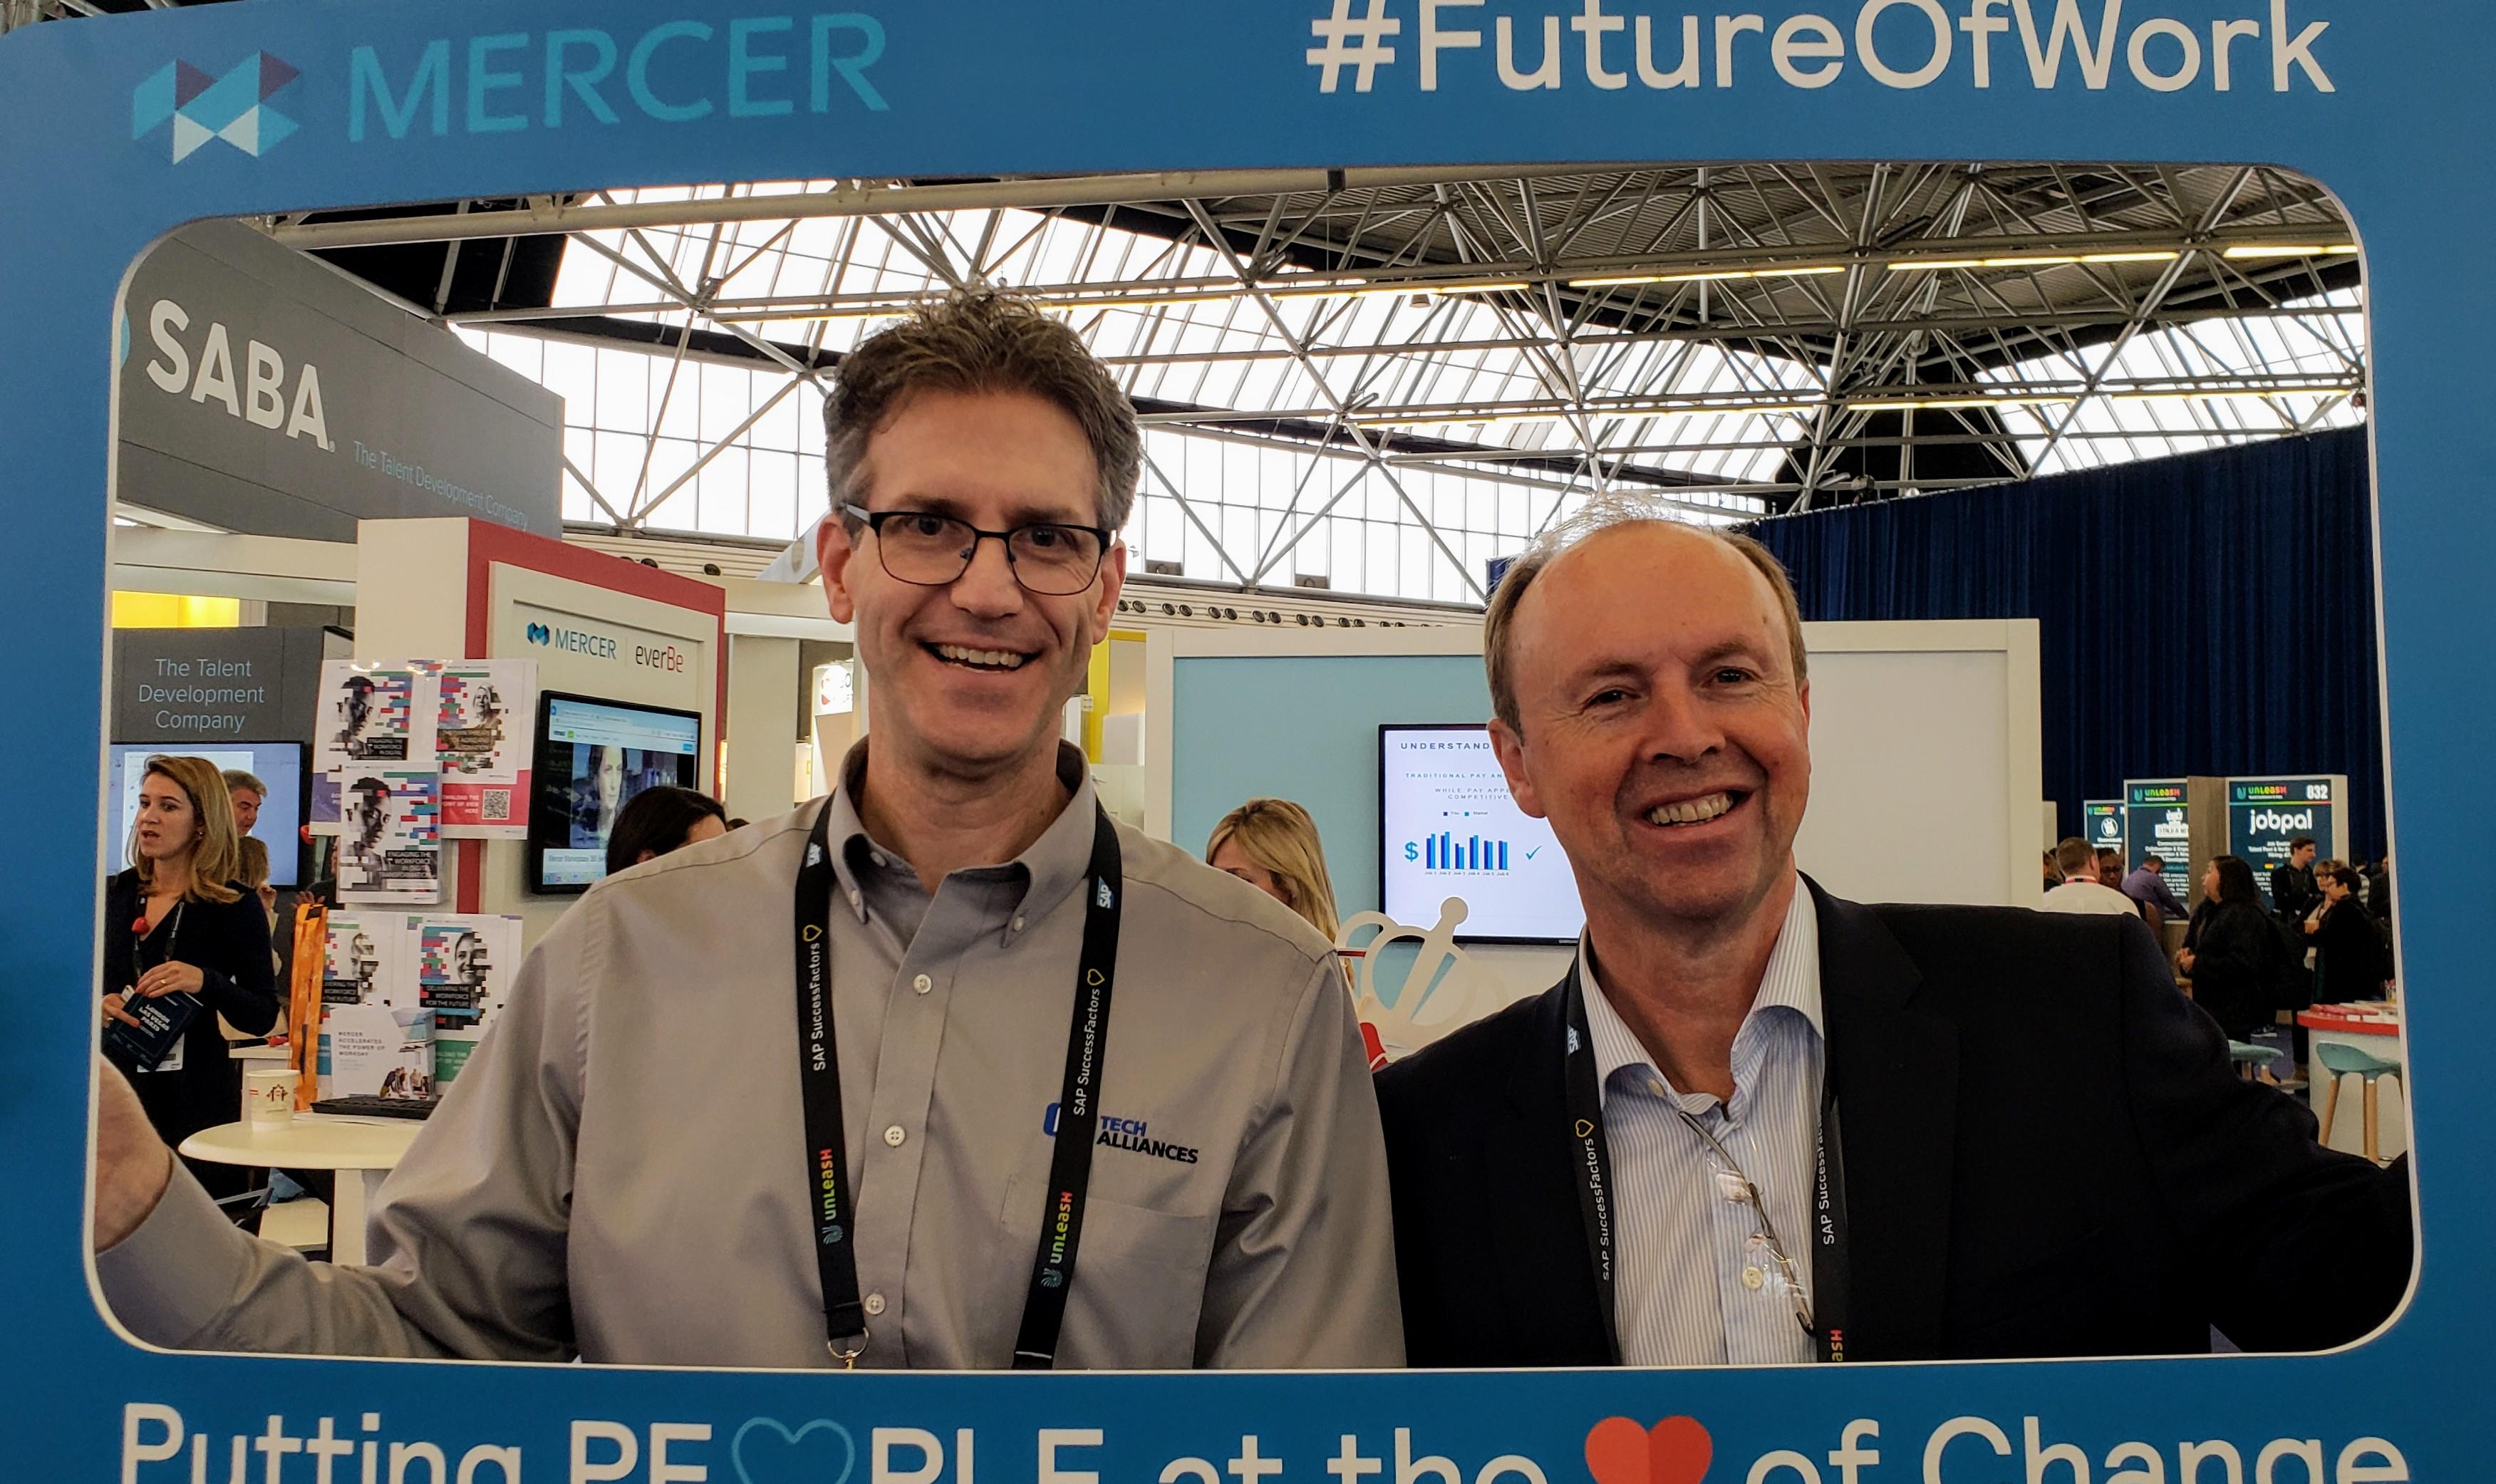 Ward Christman & John Cusack hamming it up at #UNLEASH18 in Amsterdam @Mercer #FutureOfWork booth #HRTech